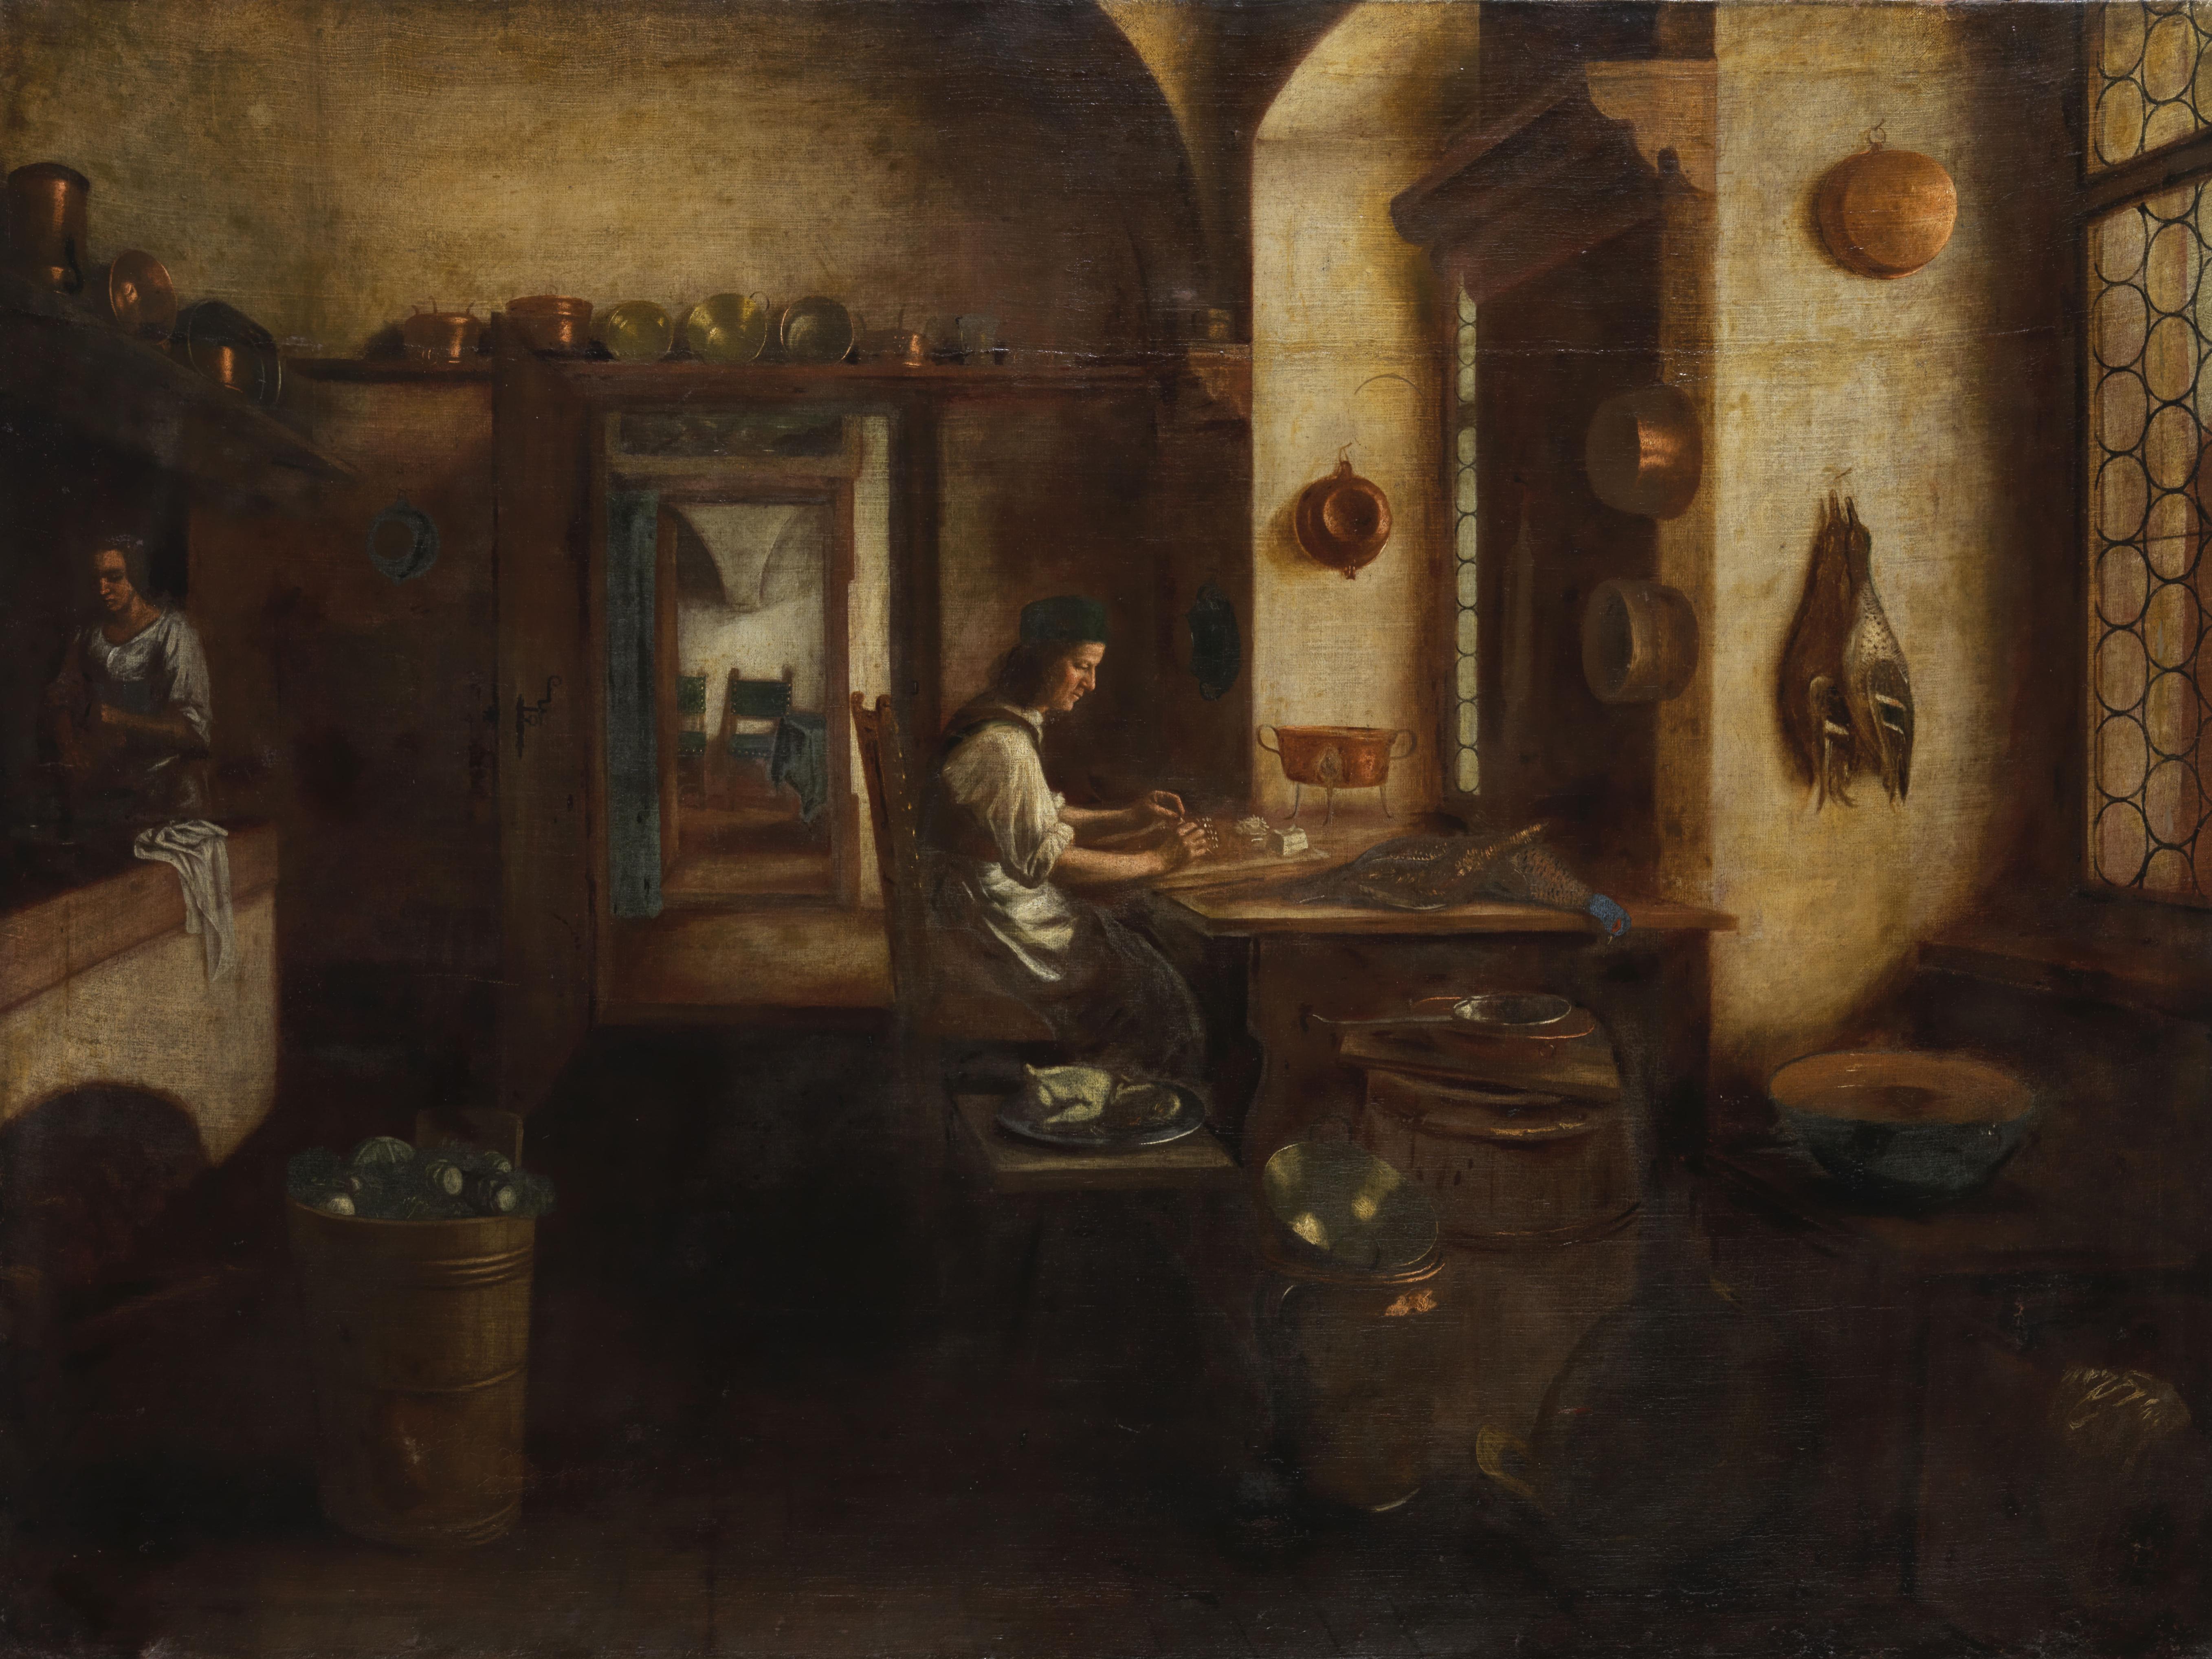 File:Pieter de Hooch (attr) Kücheninterieur.png - Wikimedia Commons